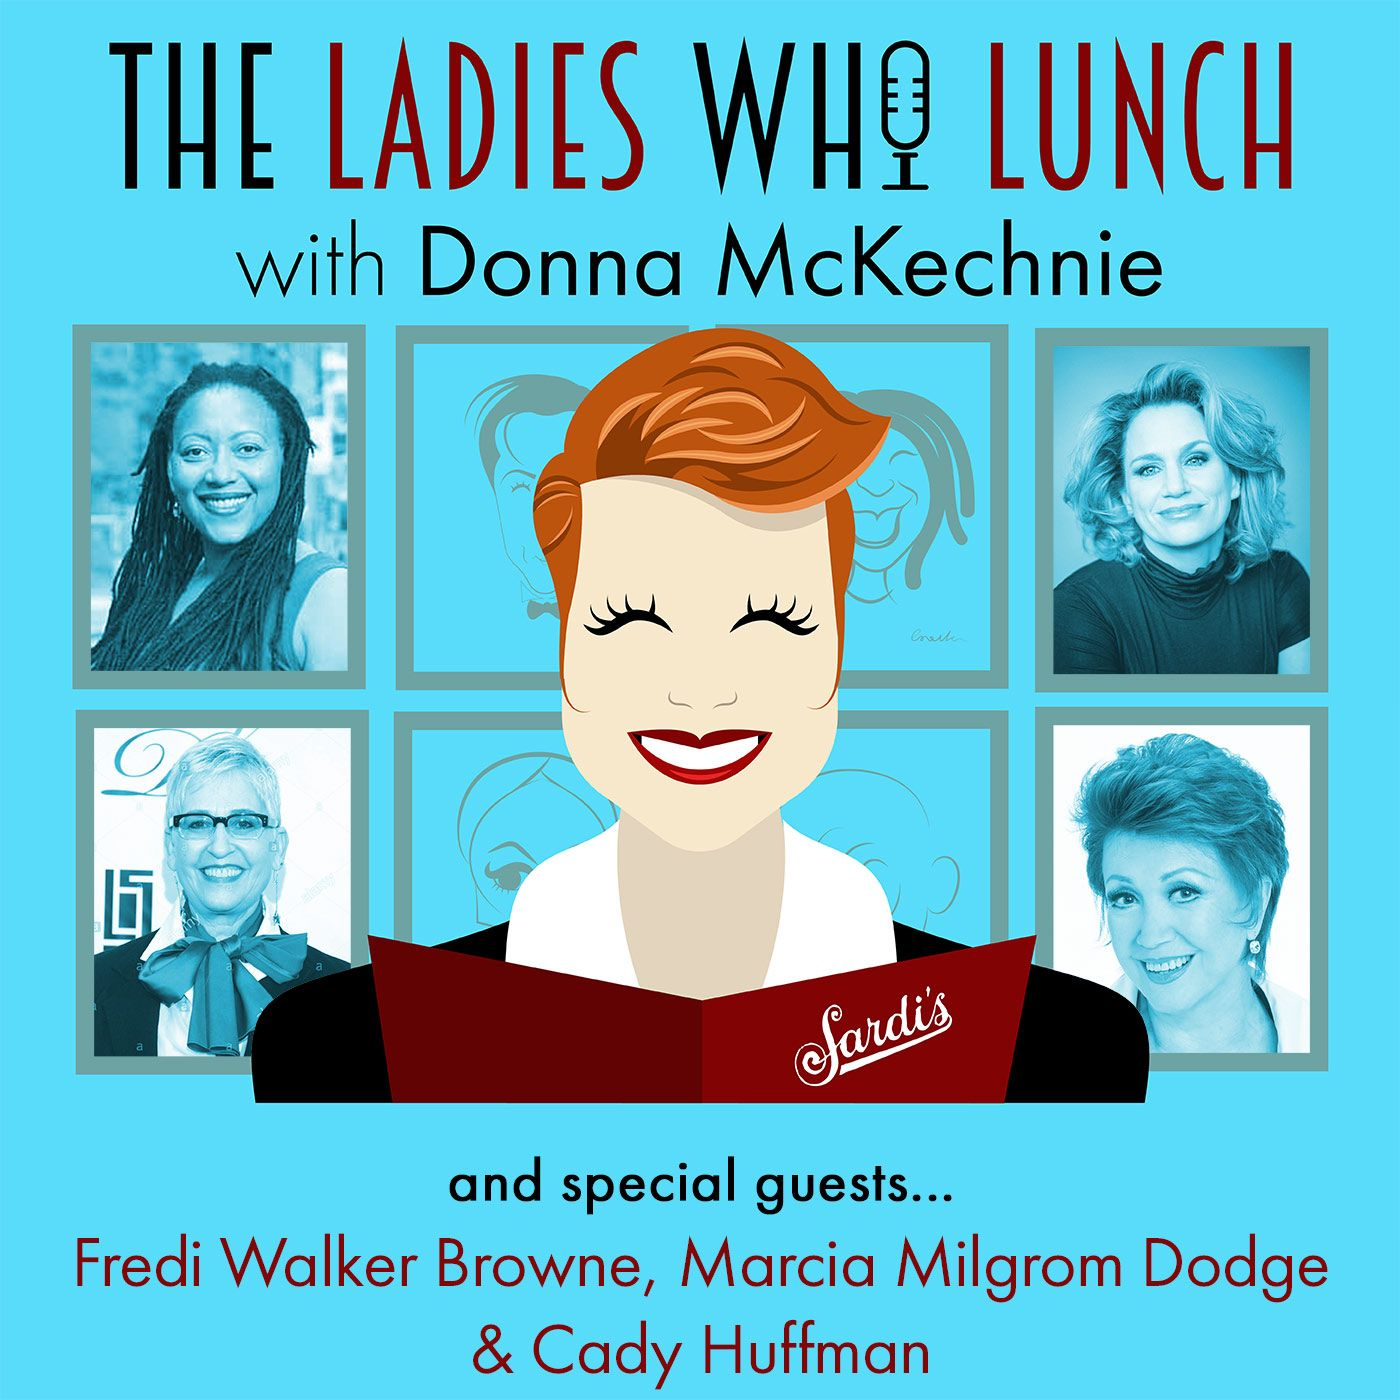 #2 - Fredi Walker-Browne, Marcia Milgrom Dodge & Cady Huffman